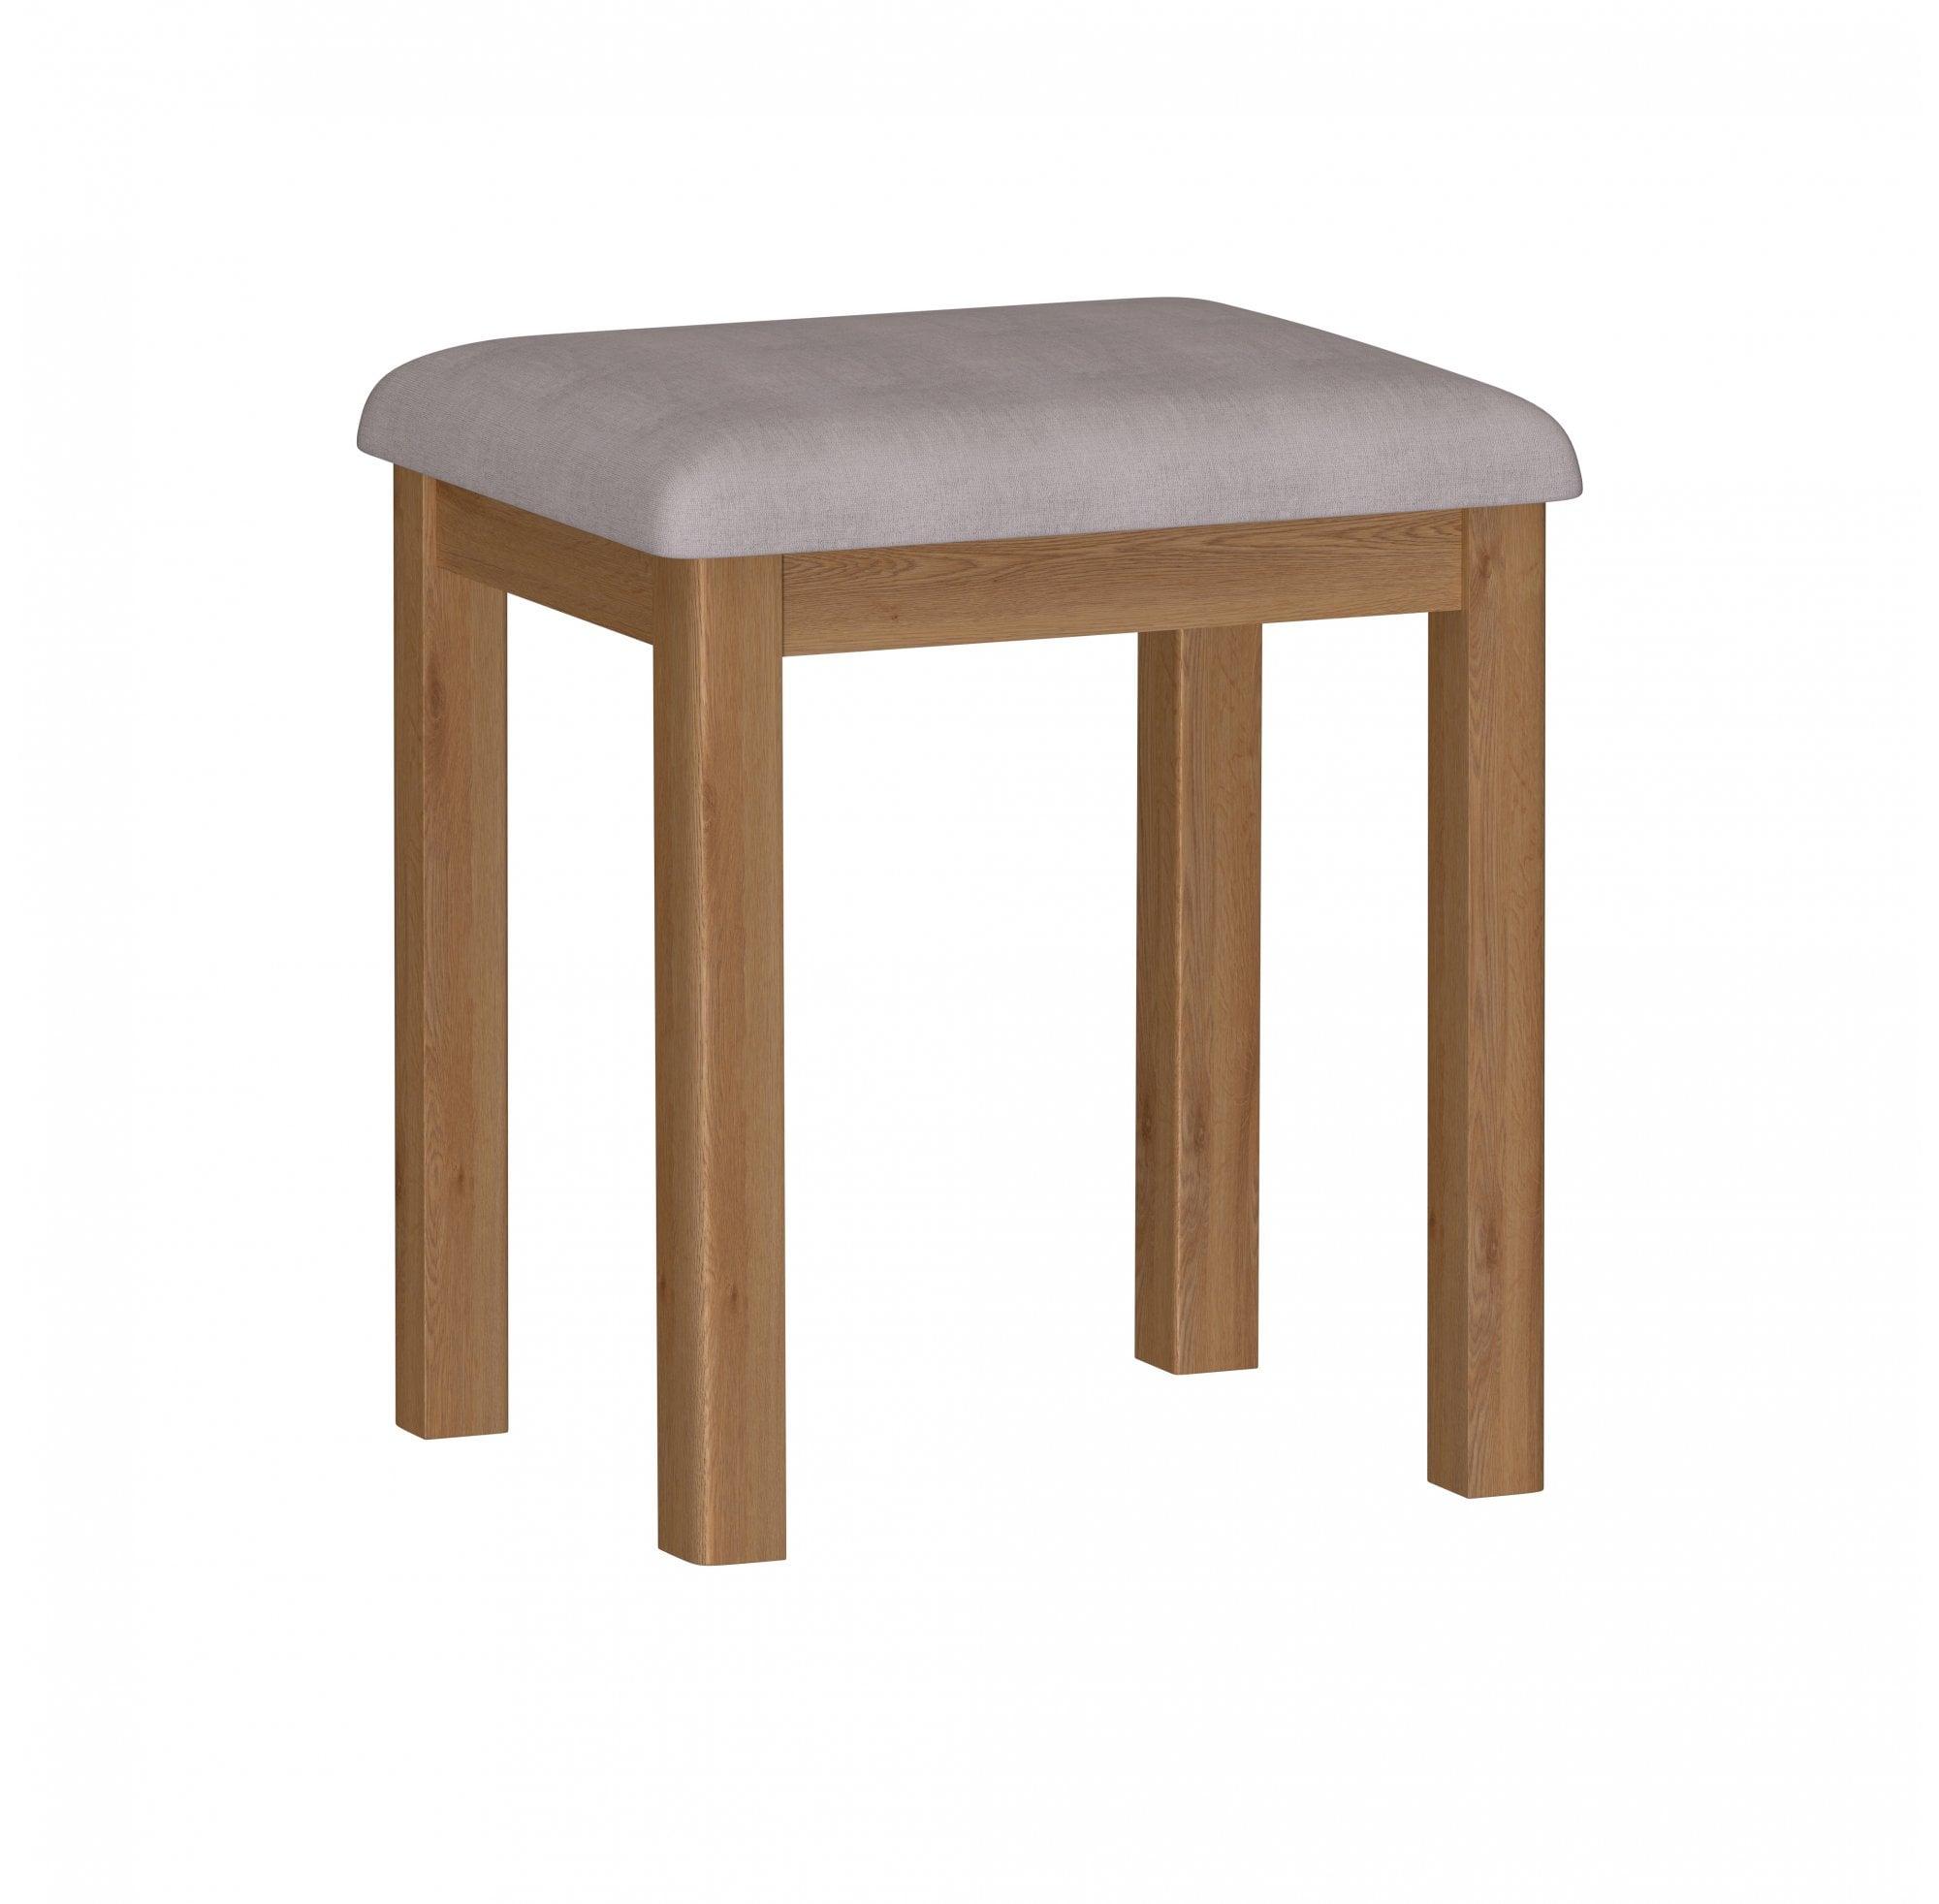 Newbarn Oak Bedroom Stool Furniture Sale From Readers Interiors Uk